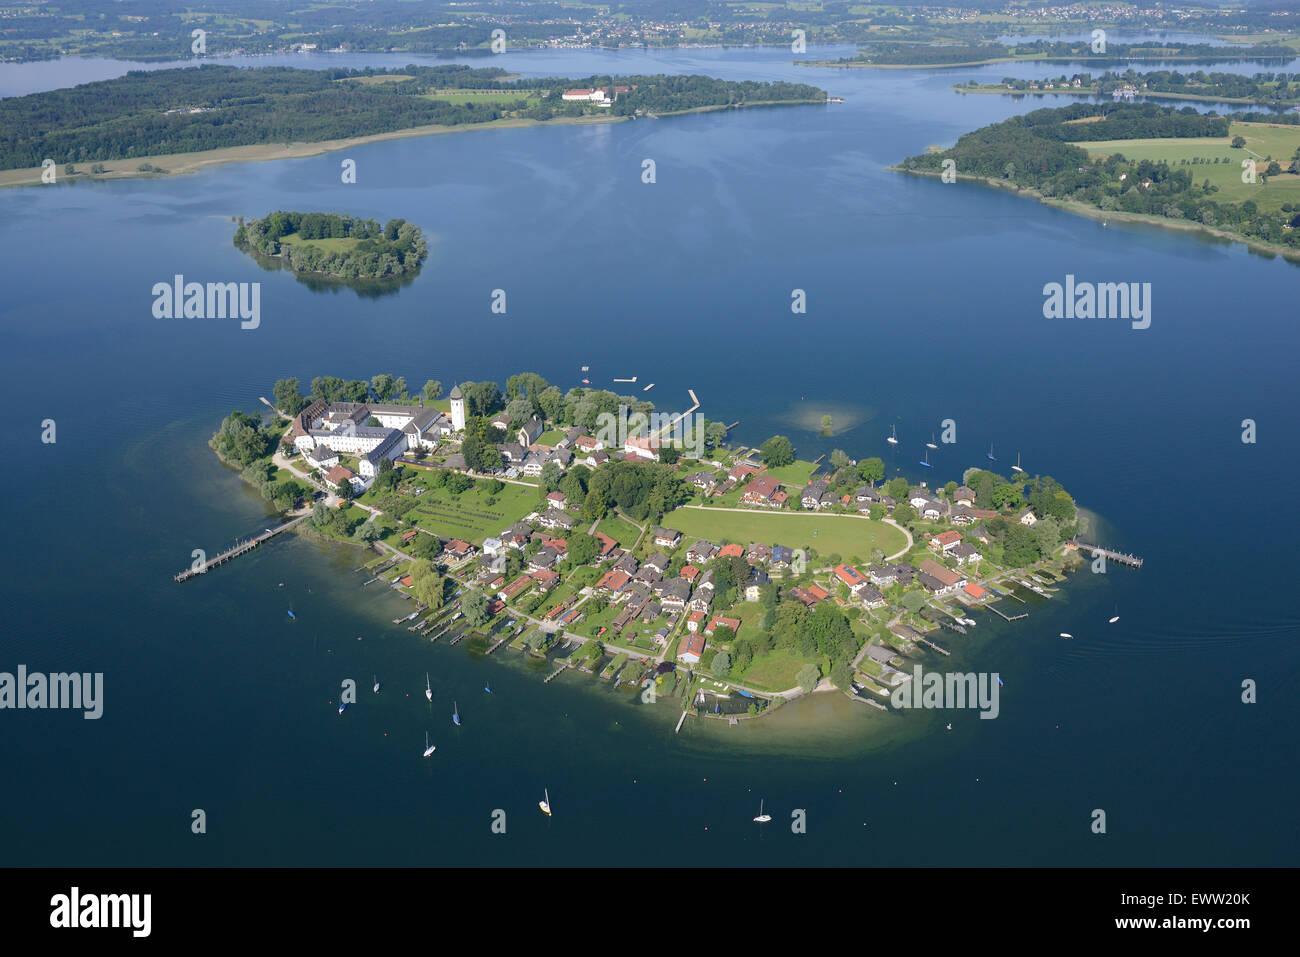 FRAUENCHIEMSEE also FRAUENINSEL ISLAND (aerial view). Lake Chiemsee, Bavaria, Germany. Stock Photo